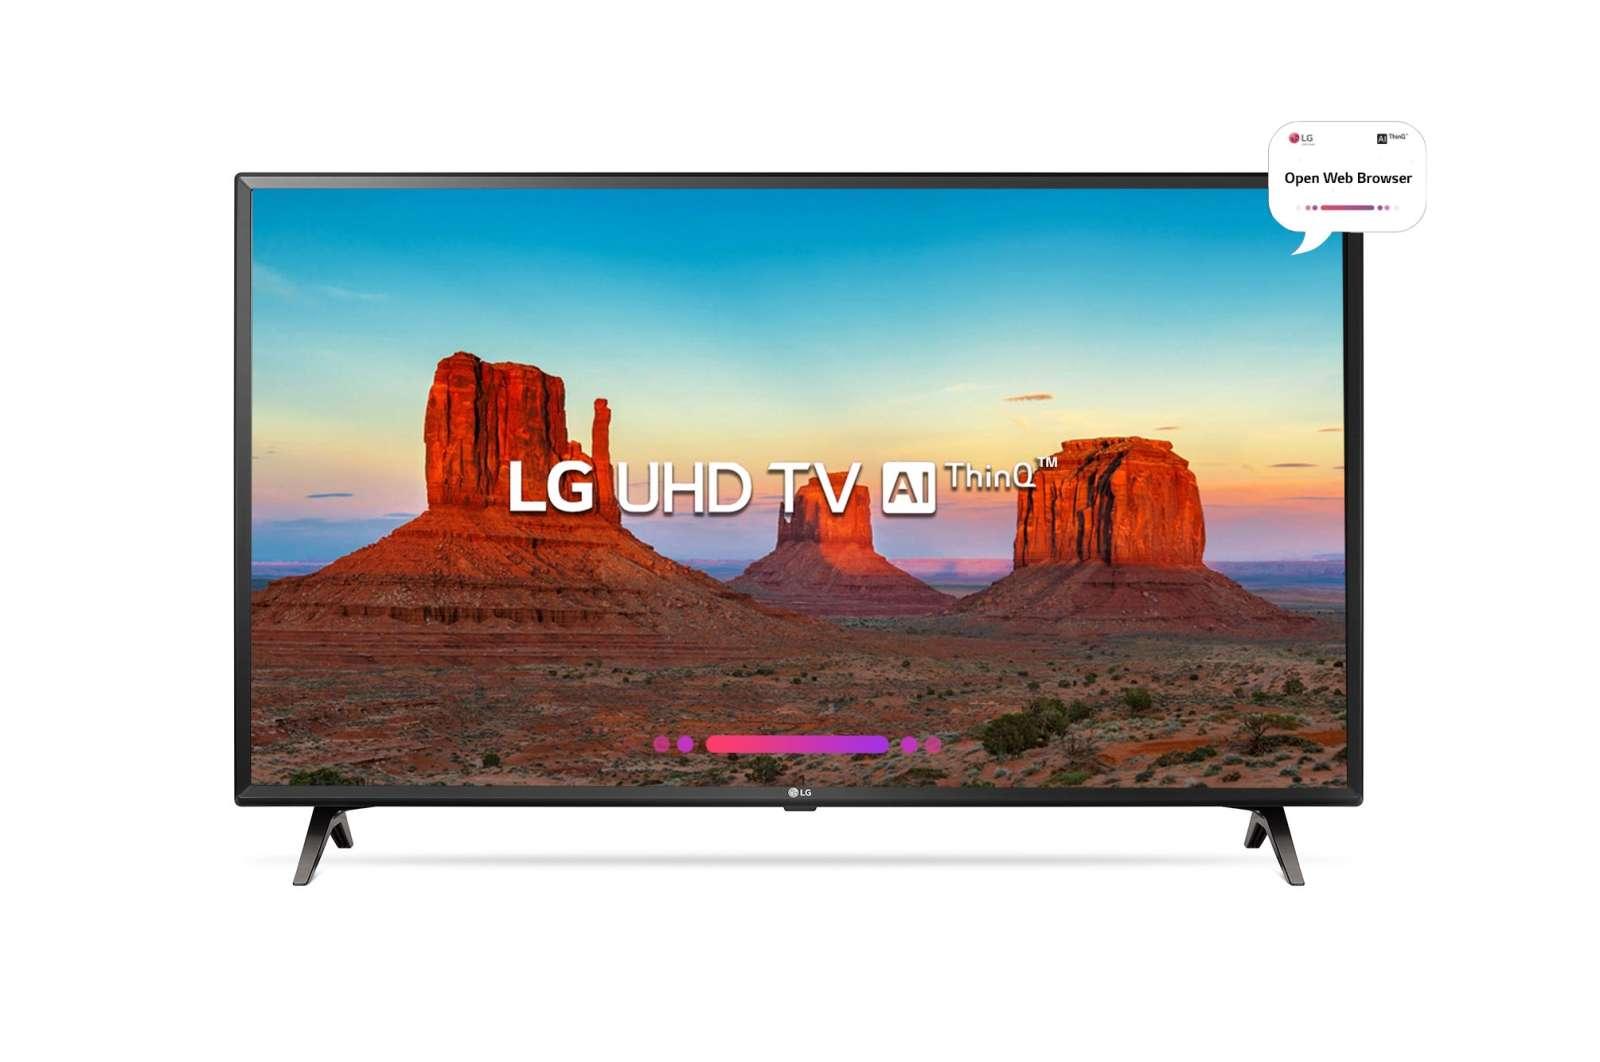 LG 43 Inches Ultra HD (4K) LED Smart TV (43UK6360PTE, Black)